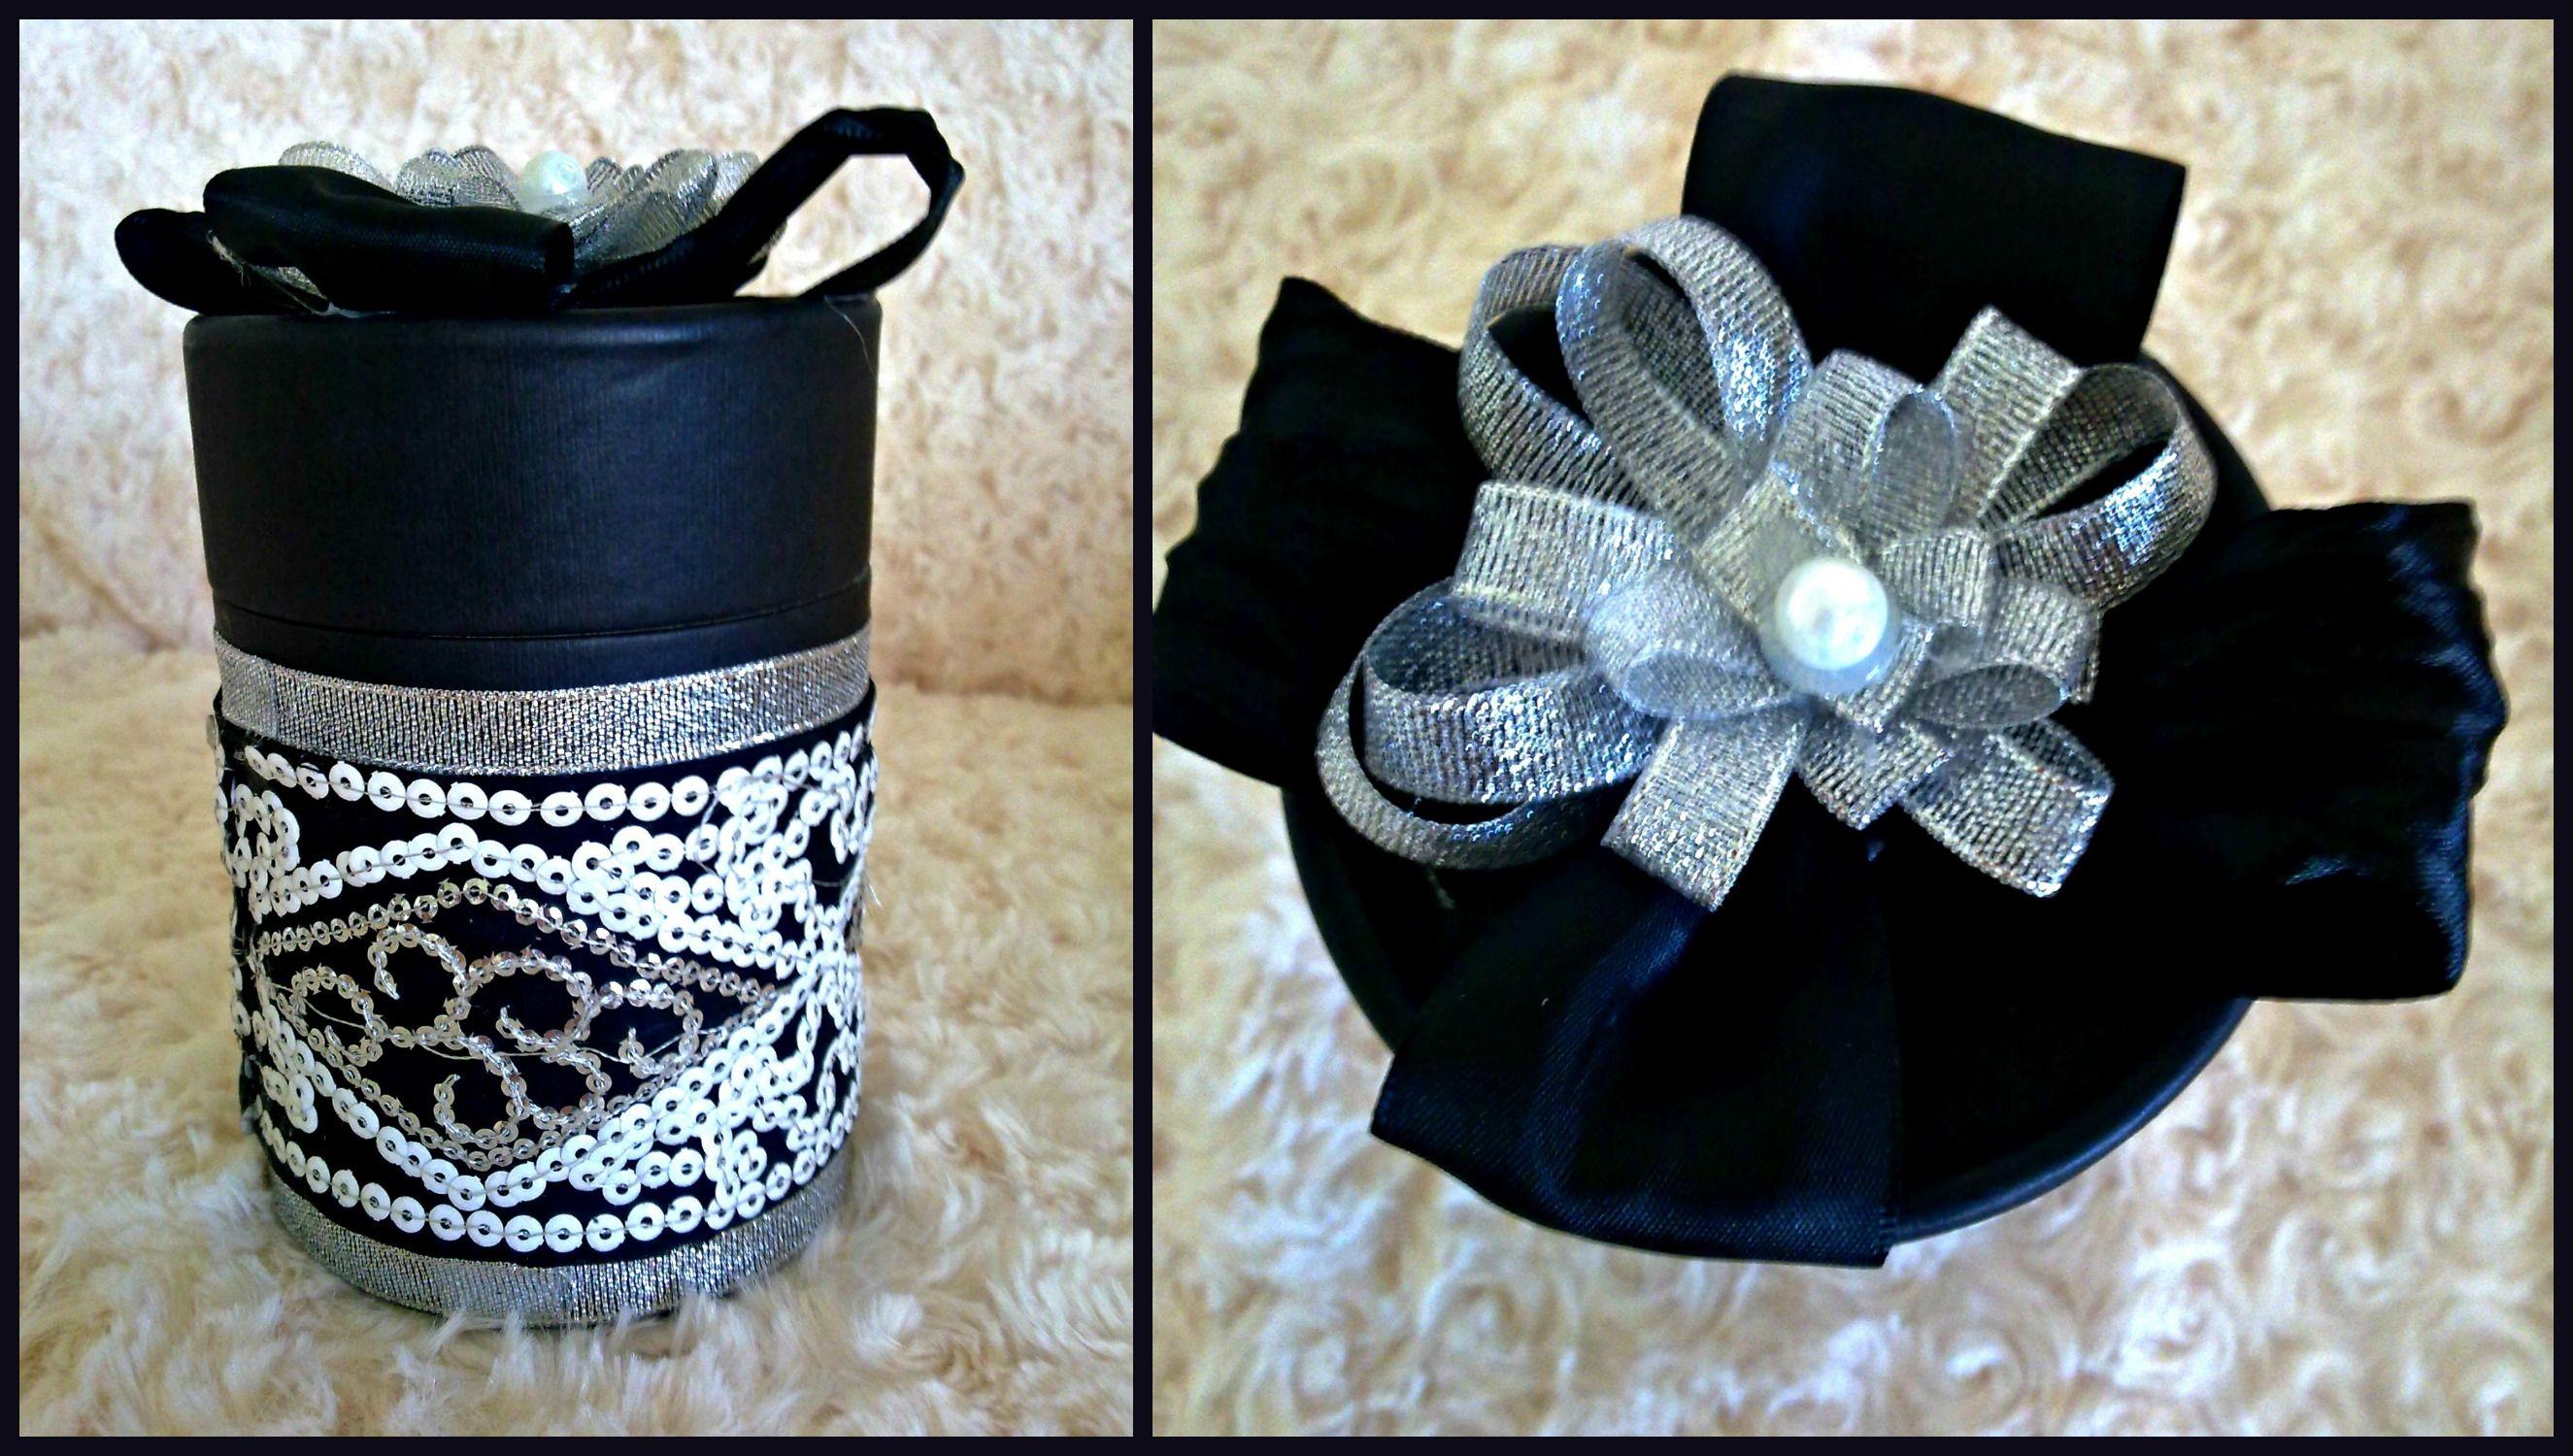 DIY Decorated Jar